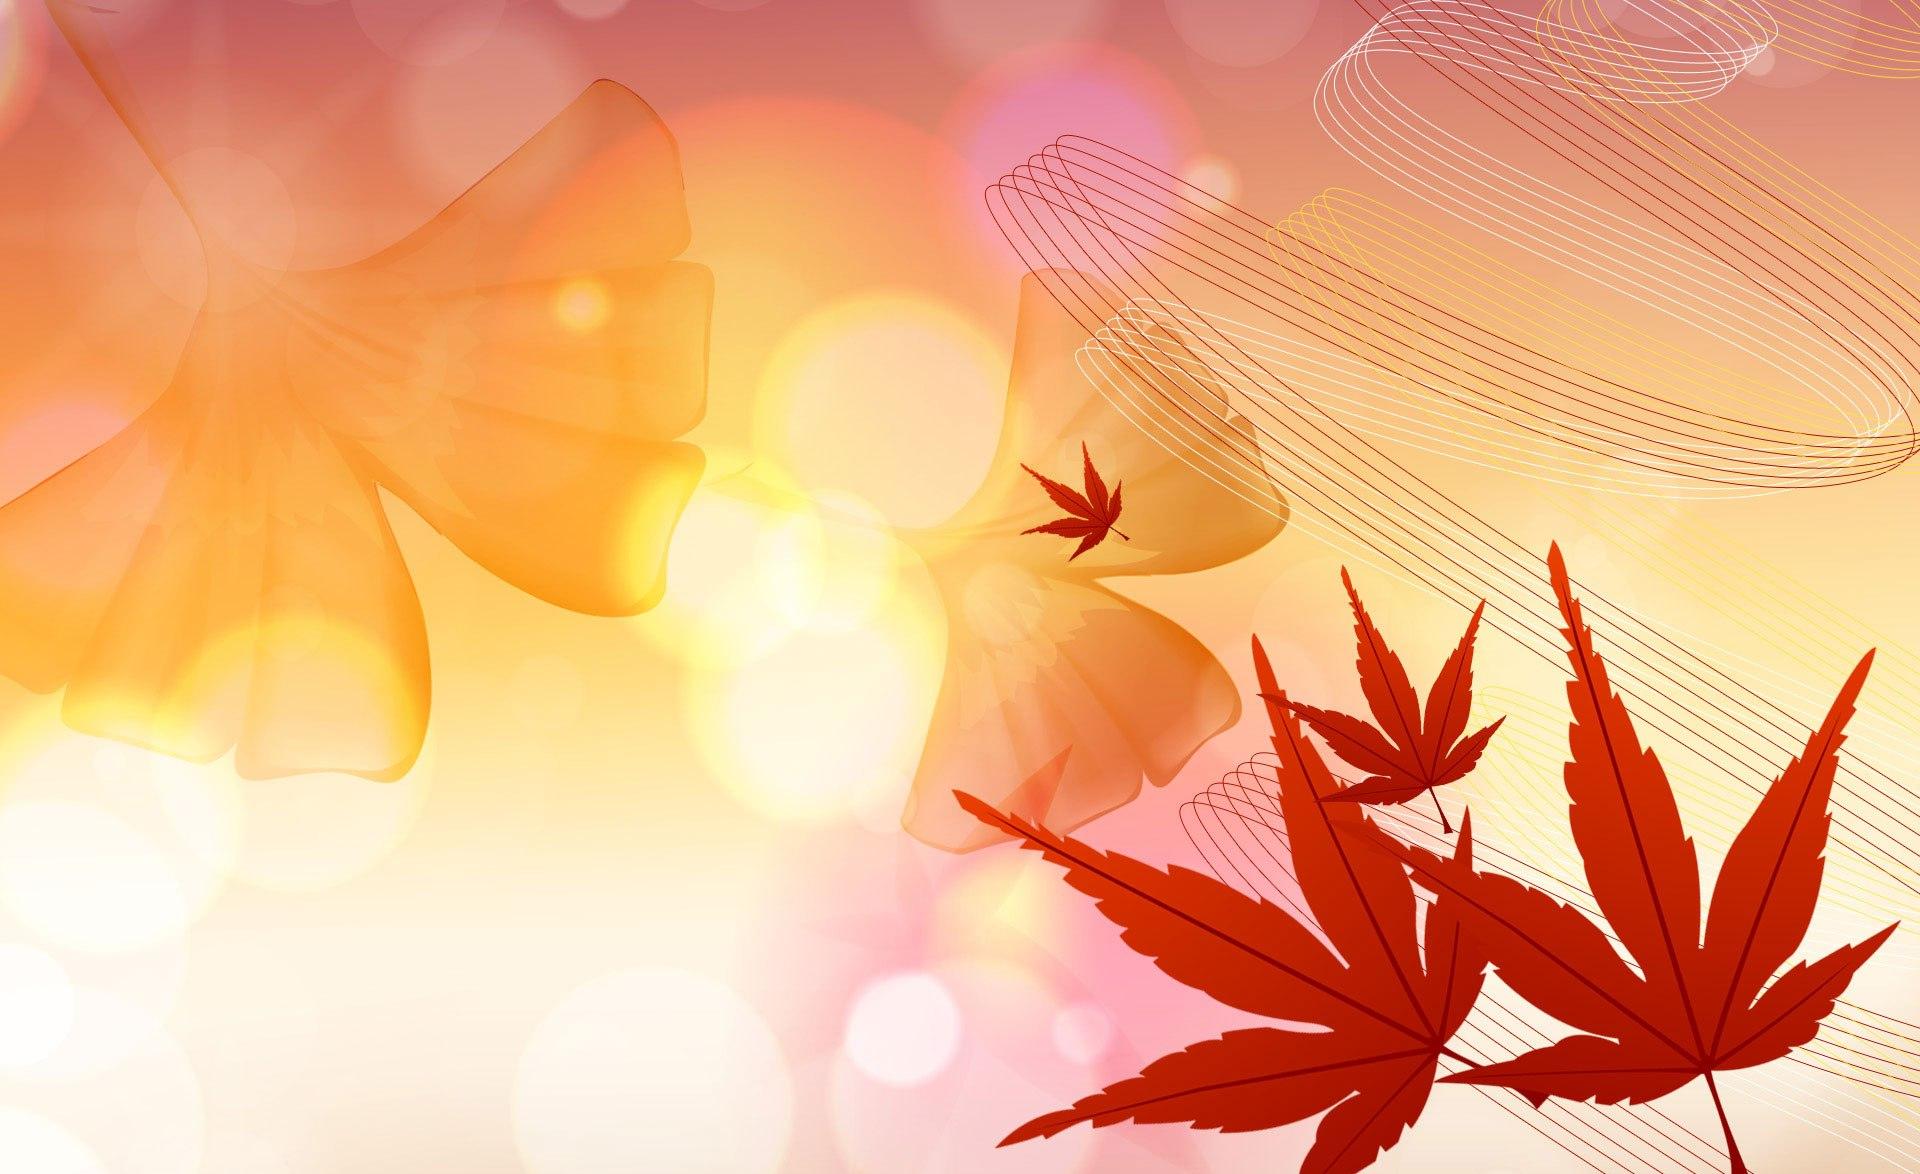 File:Autumn Colors.jpg - Wikimedia Commons